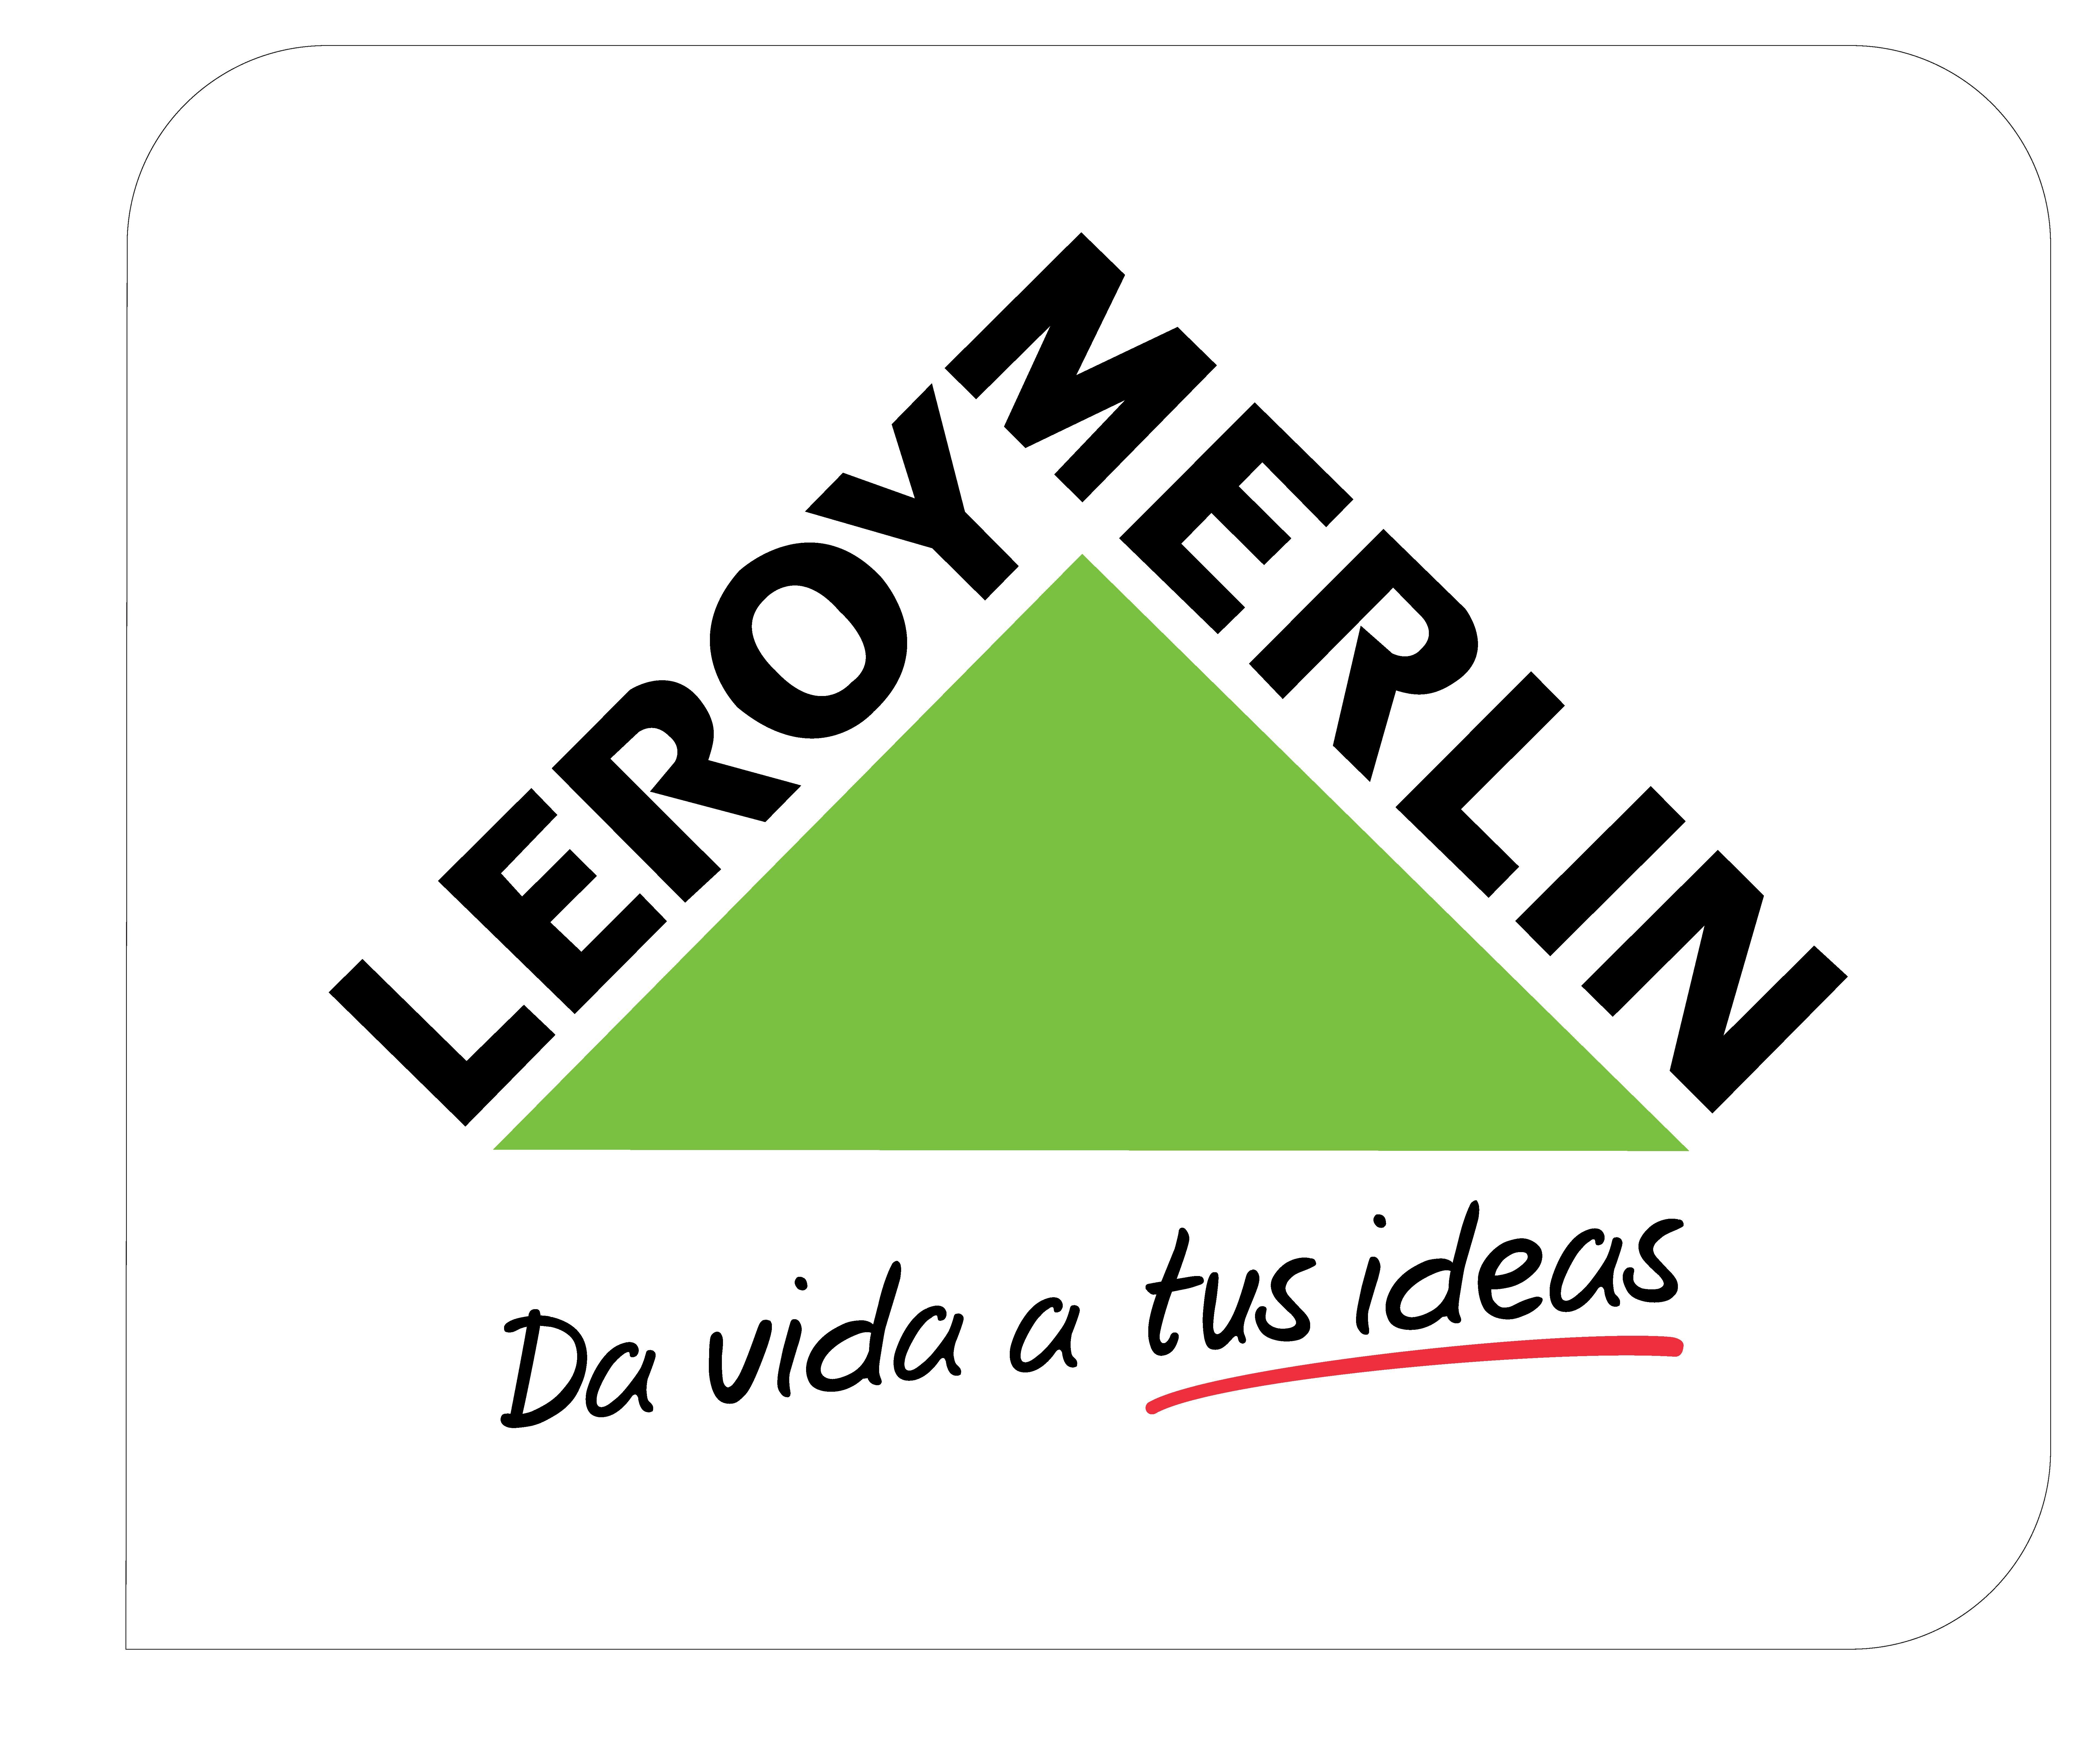 Imagen 2 https://www.codid-rm.com/wp-content/uploads/2015/07/LOGO-LEROY-MERLIN-ILUST-10-1-1-page-001.jpg